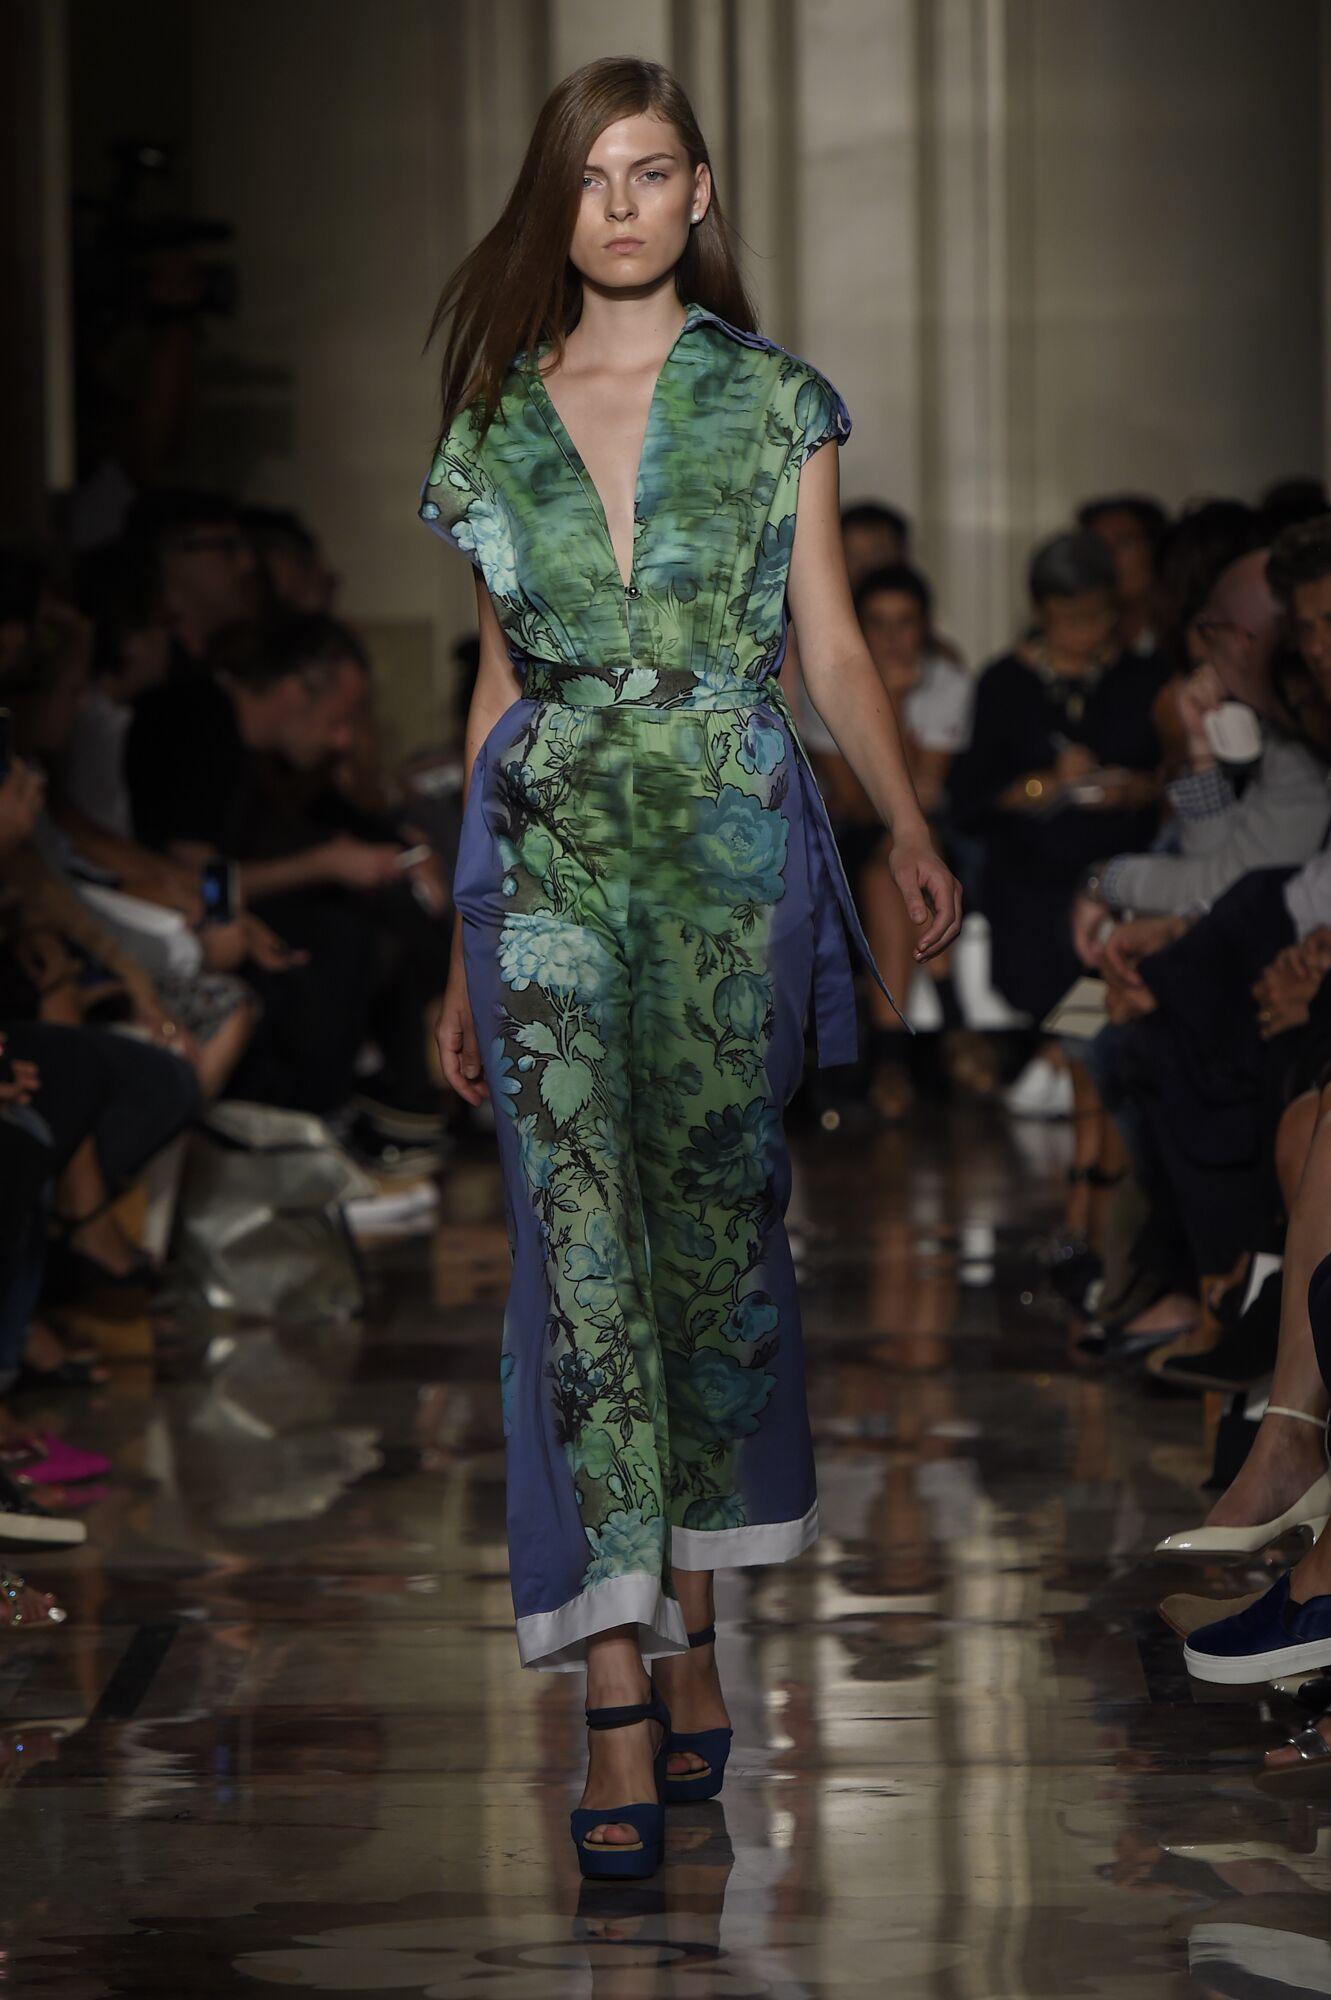 Summer 2015 Fashion Show Andrea Incontri Runway